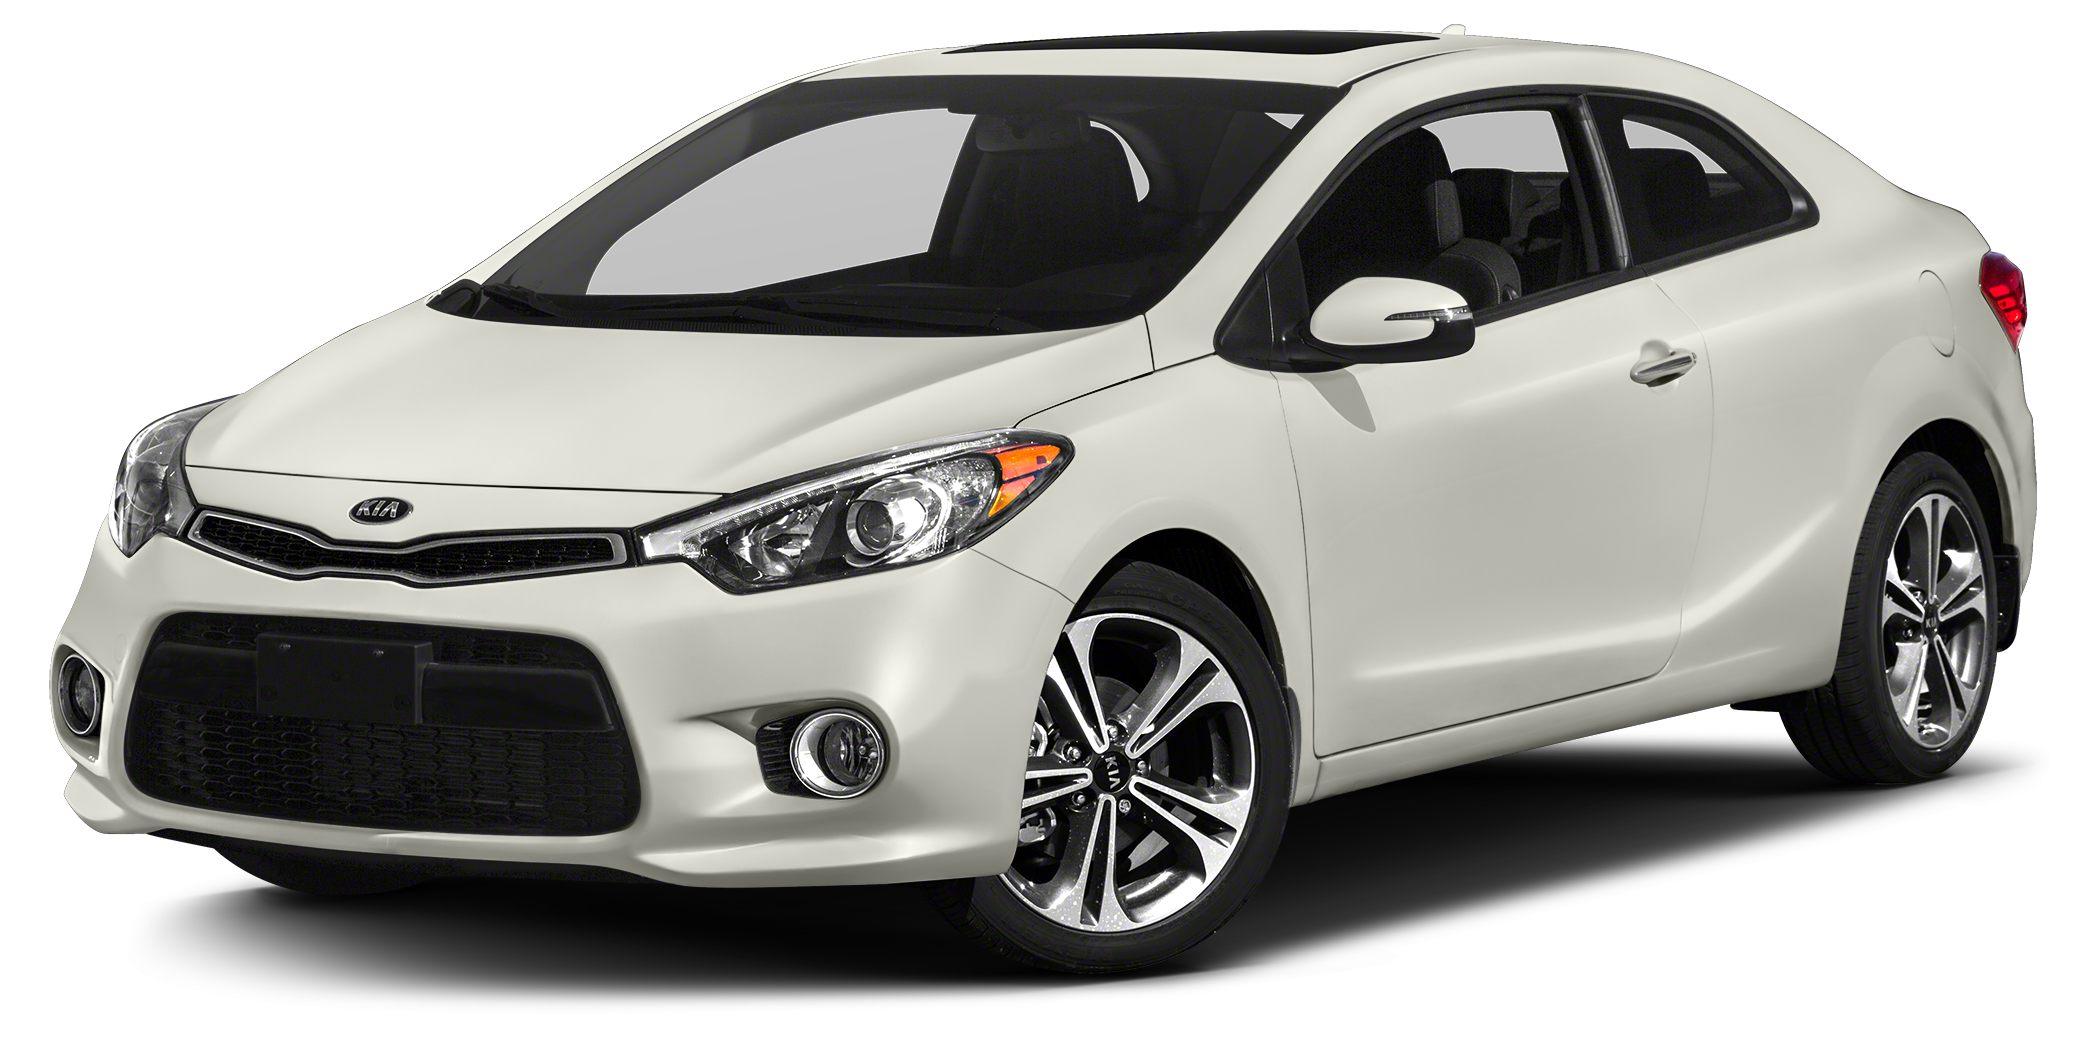 2016 Kia Forte Koup EX Miles 24Color Snow White Pearl Stock K16304 VIN KNAFX6A86G5659076